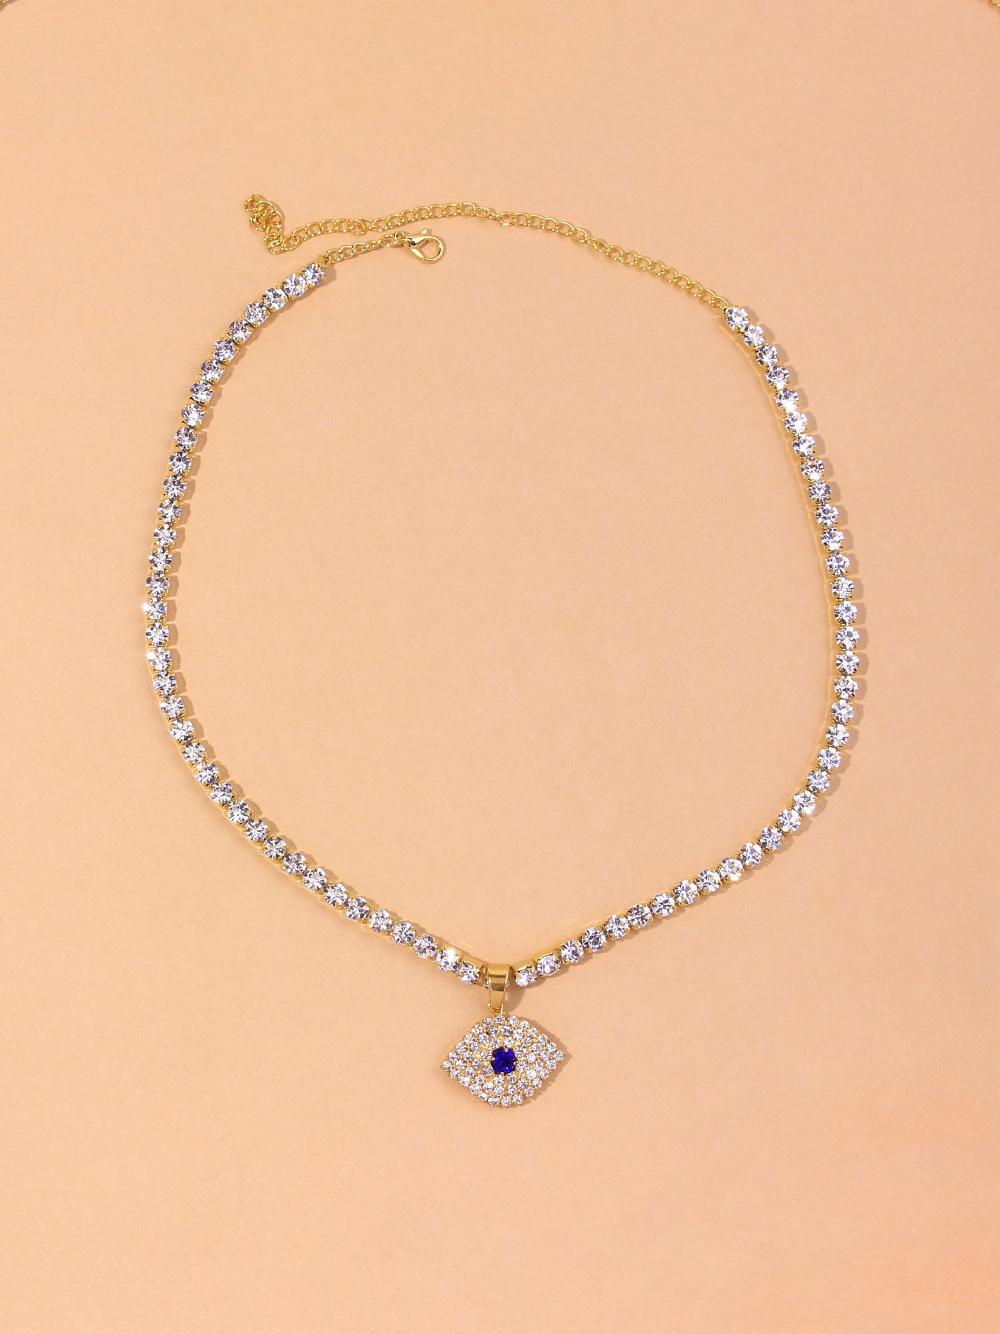 Full Rhinestone Devil's Eye Pendant Necklace